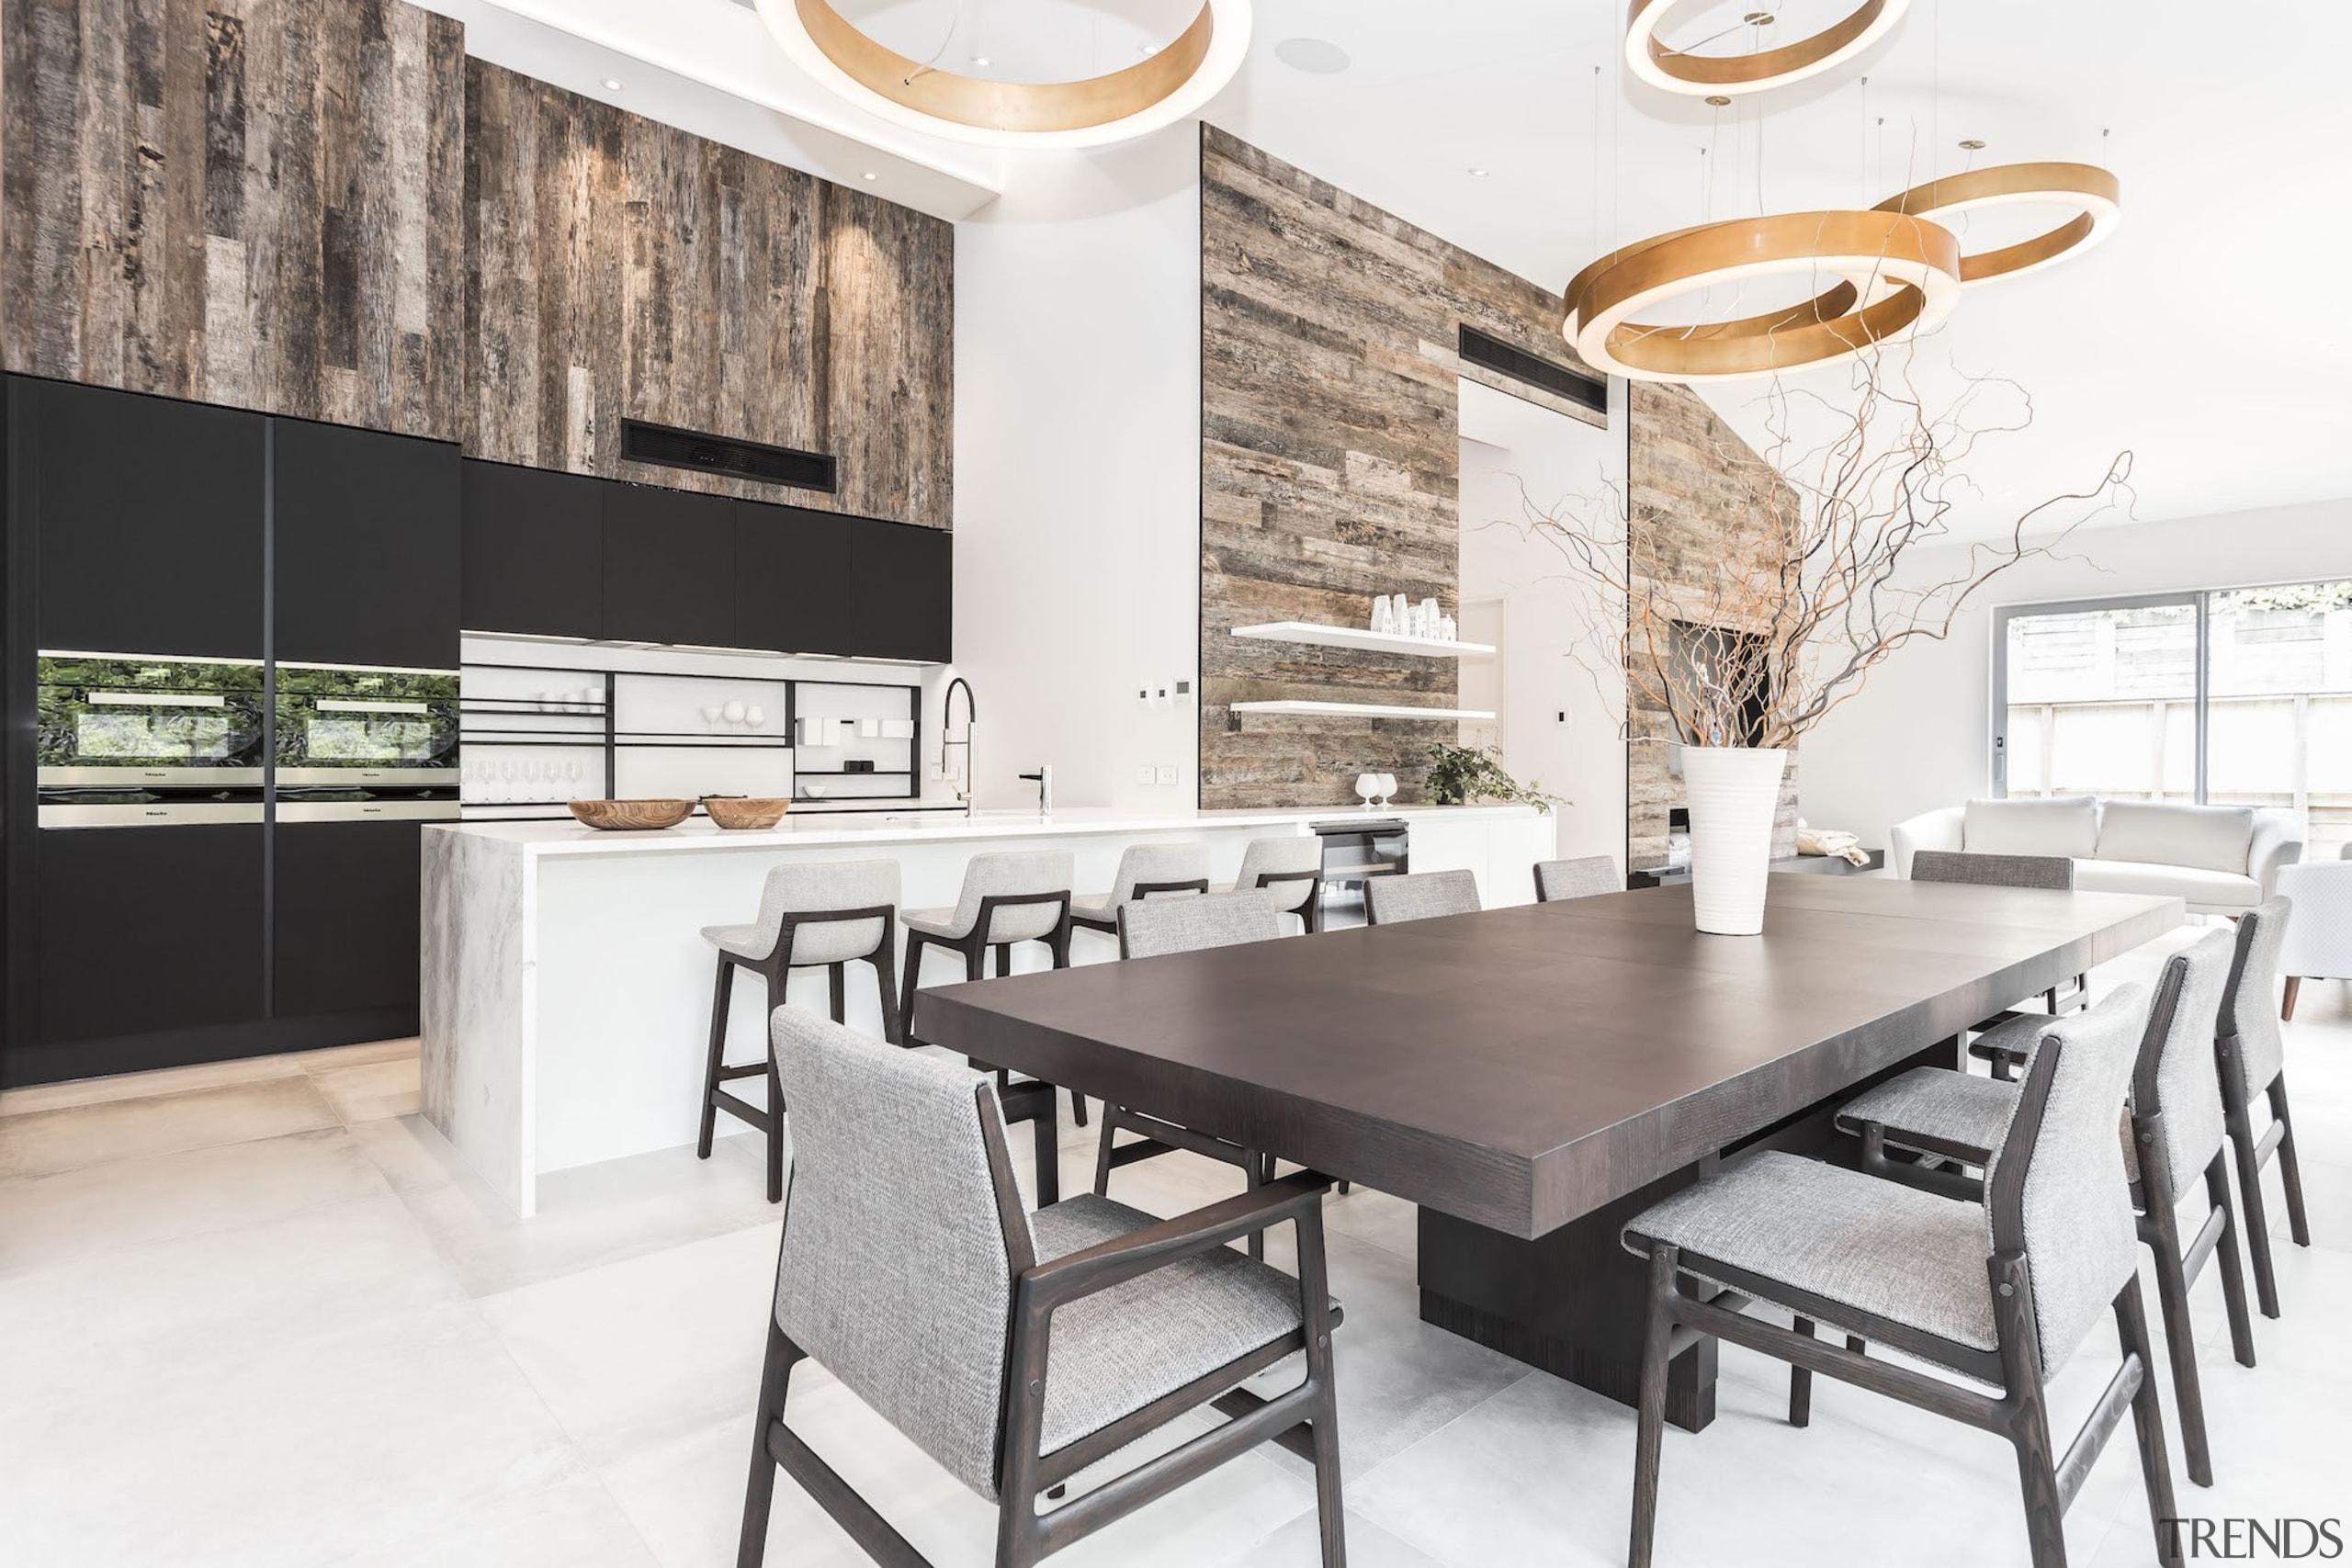 Poliform Kitchen from Studio Italia - countertop | countertop, dining room, furniture, interior design, kitchen, table, white